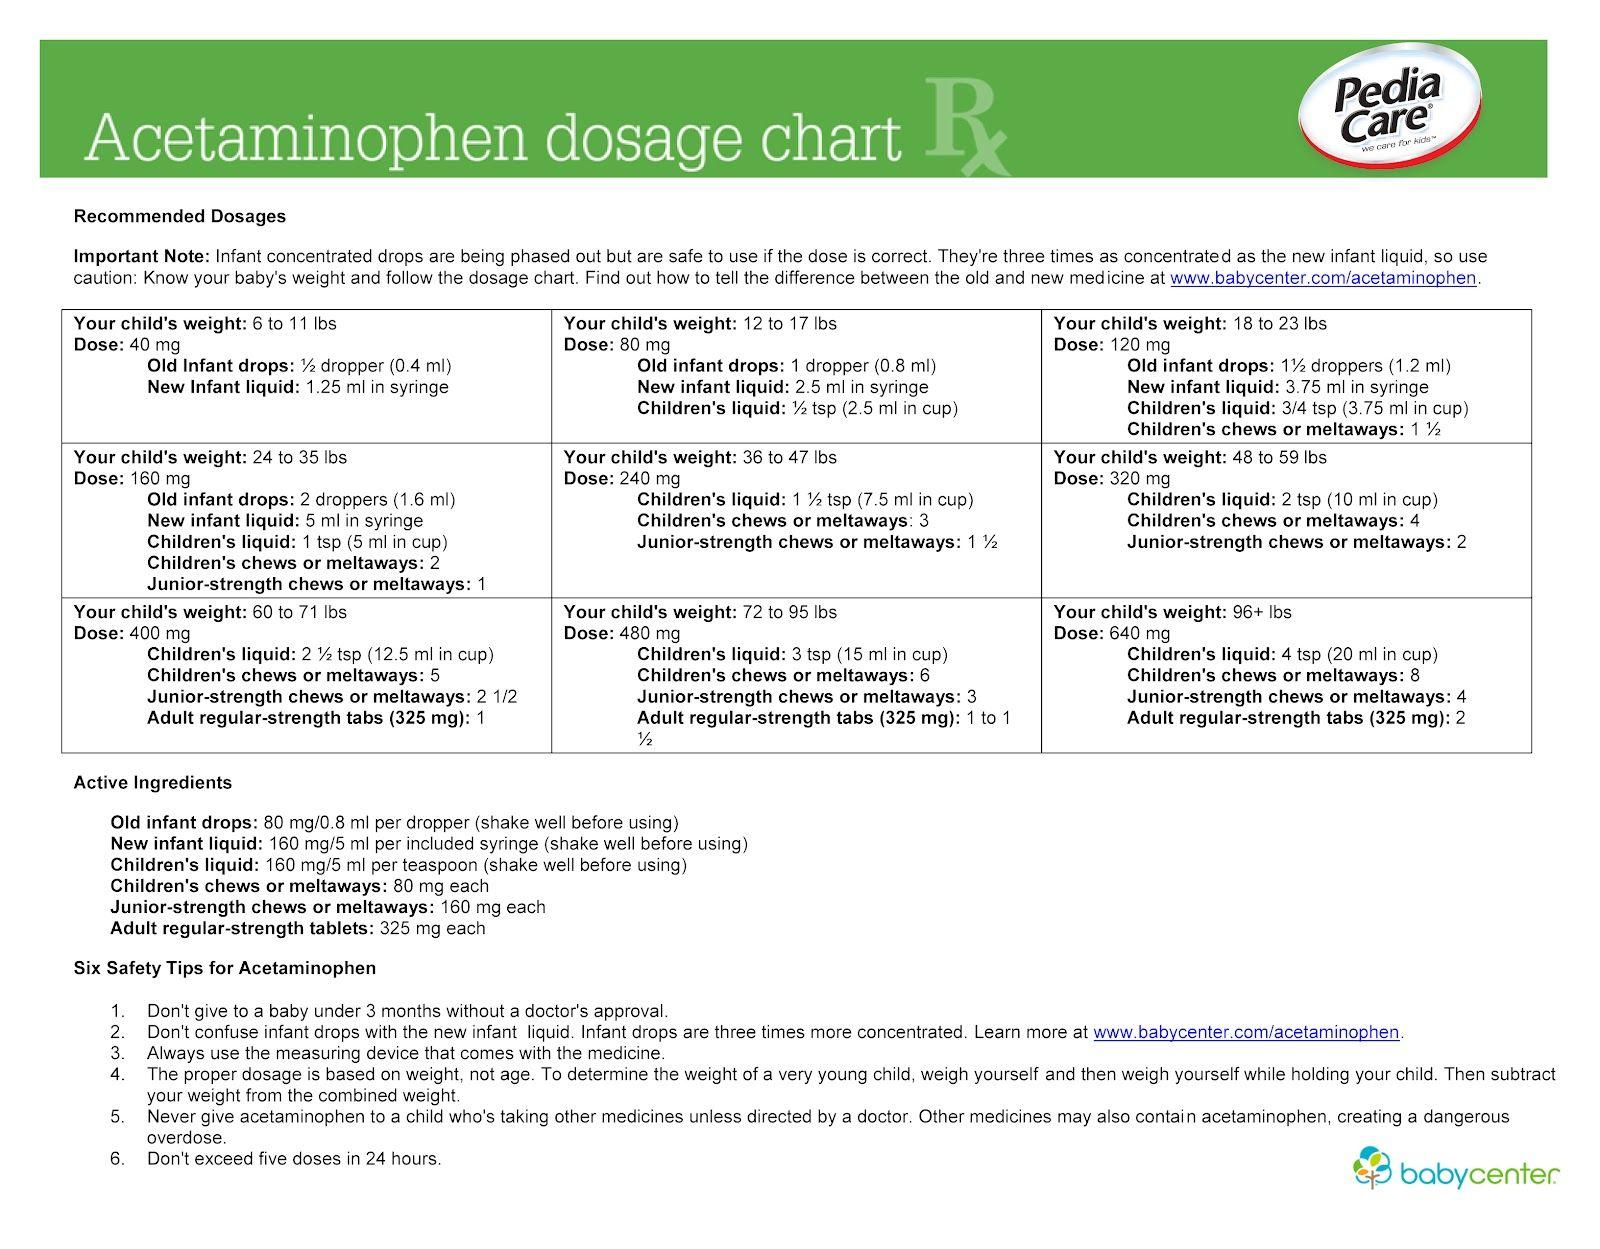 Naptime tales acetaminophen and ibuprofen dosage charts naptime tales acetaminophen and ibuprofen dosage charts nvjuhfo Images